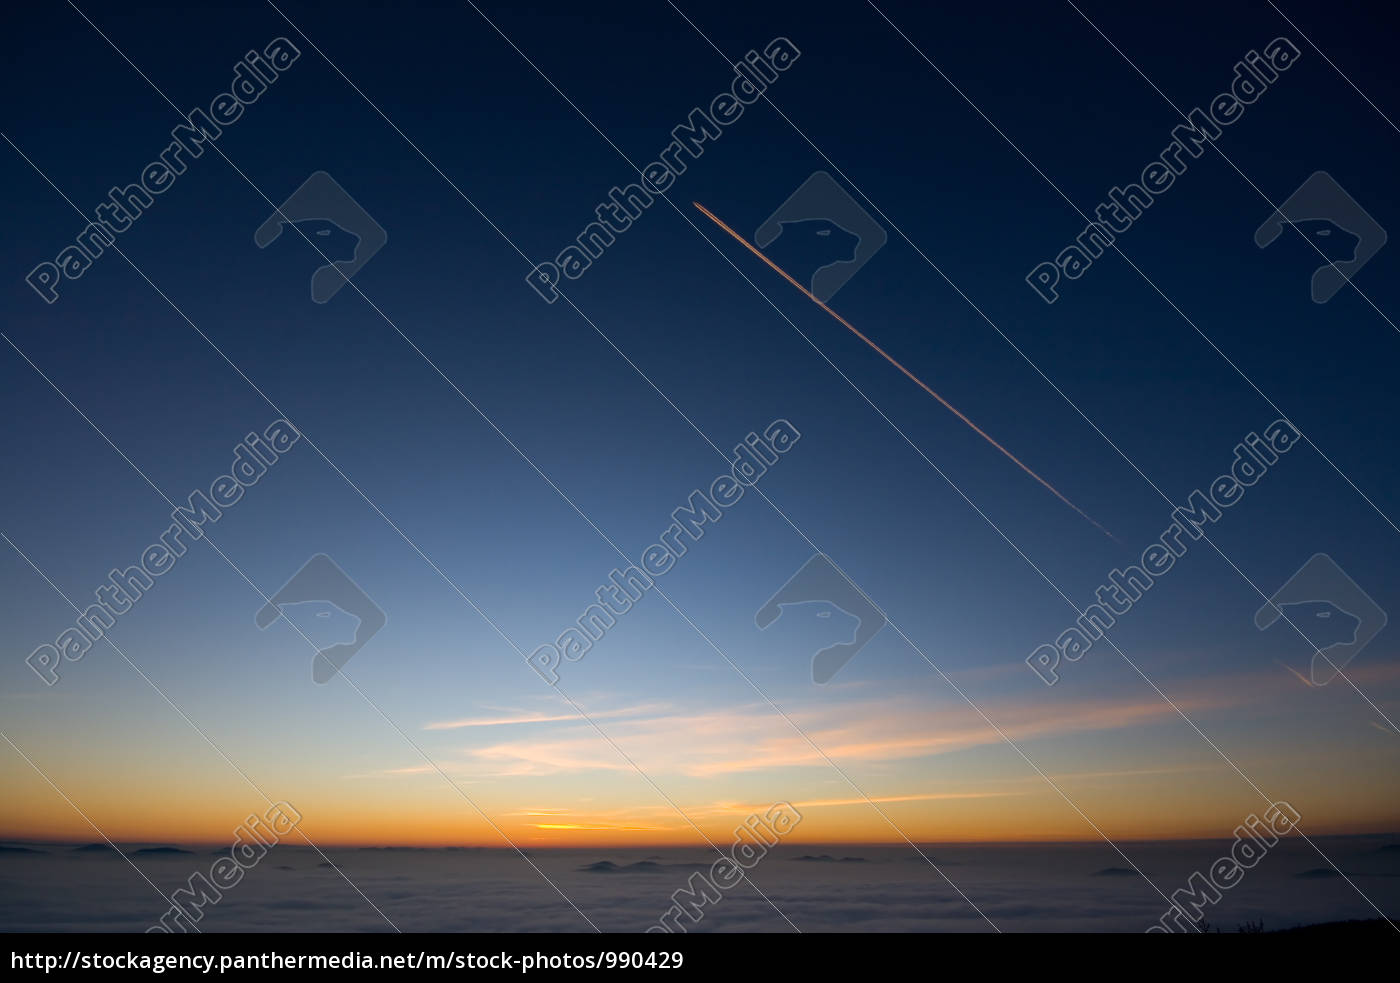 kondesstreifen, evening, sky - 990429